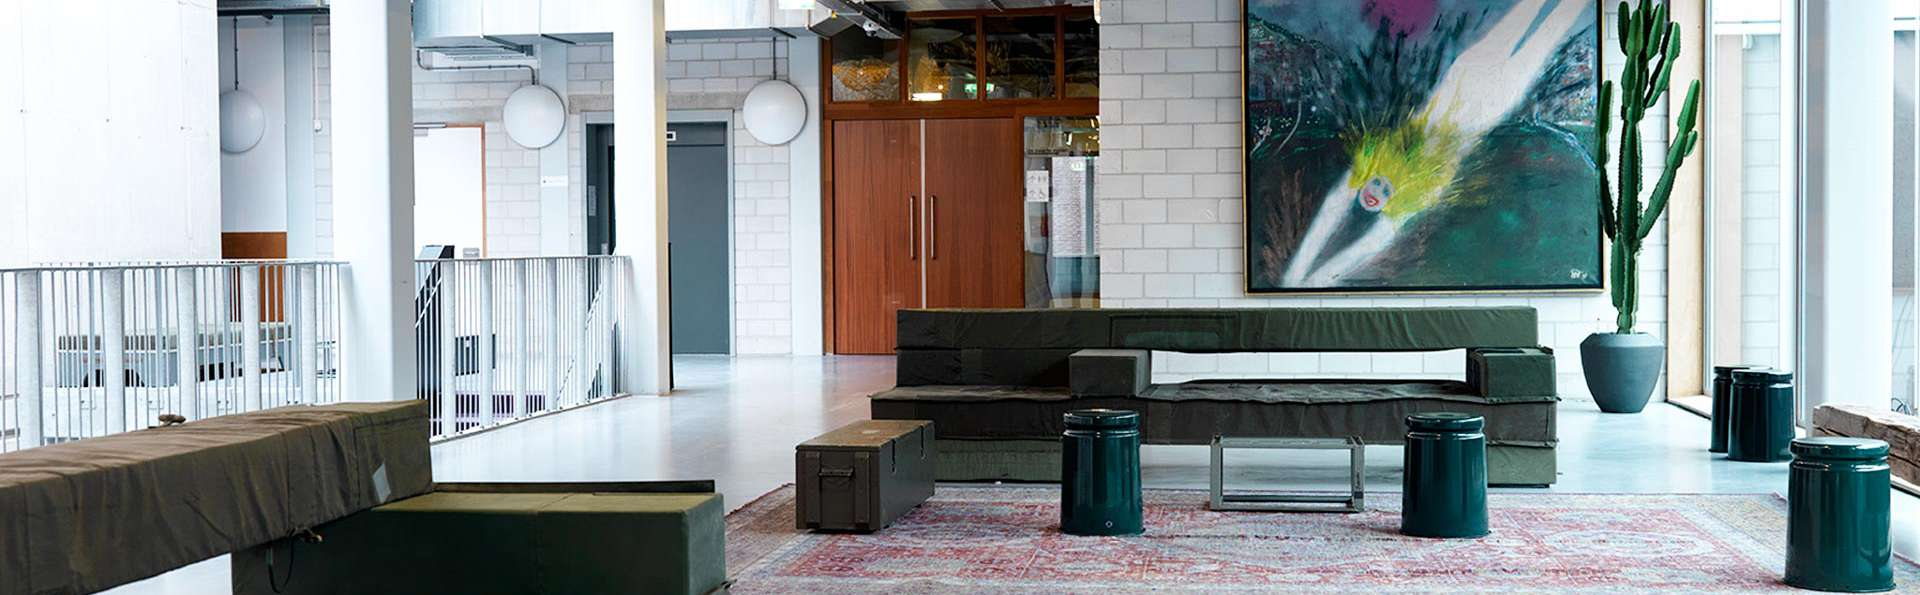 Q-Factory Hotel  - EDIT_LOUNGE_01.jpg